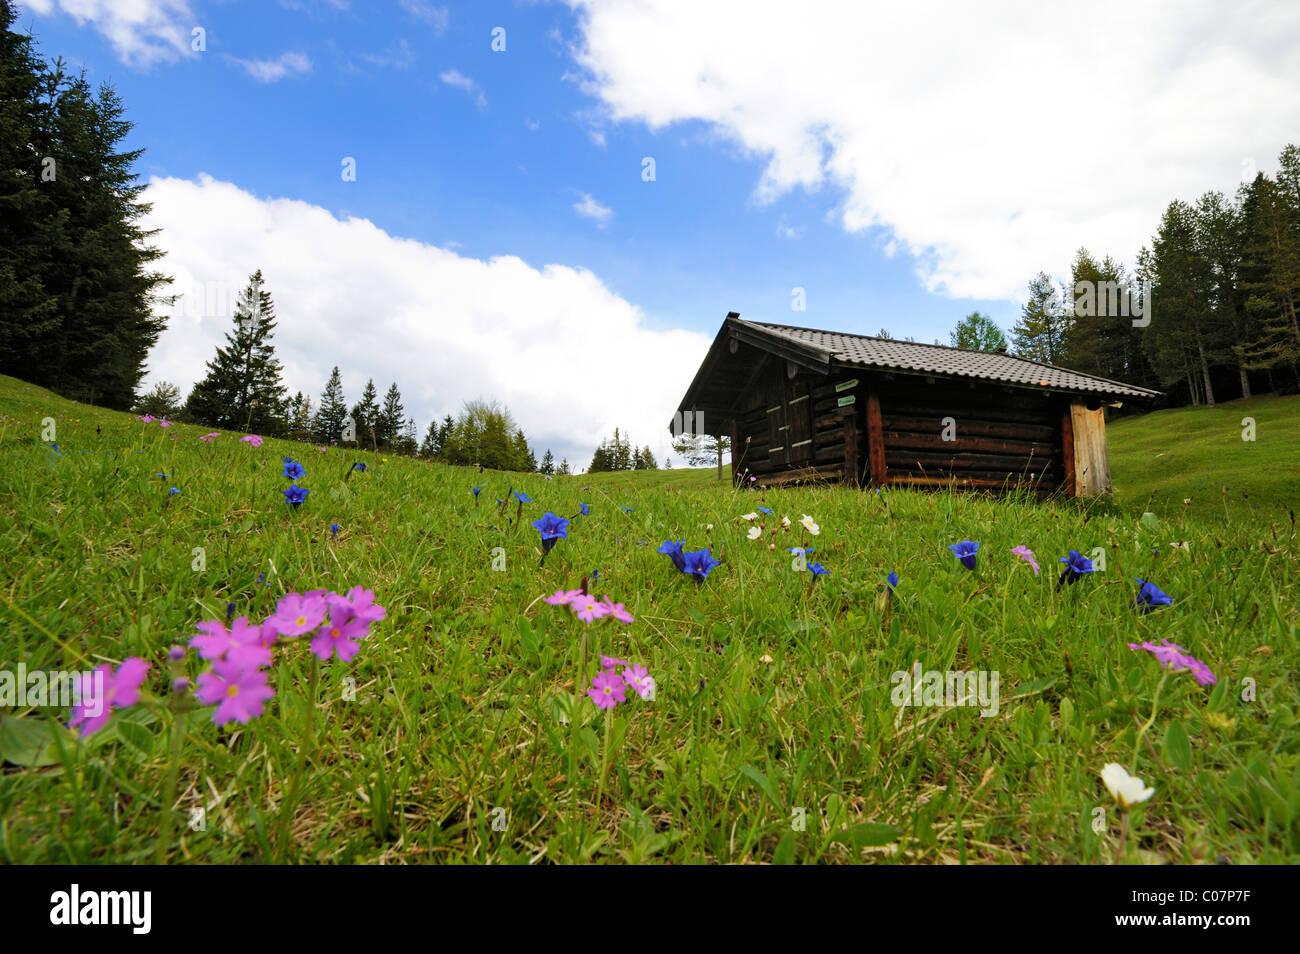 Hump meadows with hay barn at Kranzberg, Karwendelgebirge mountains, Mittenwald, Werdenfelser Land, Upper Bavaria, - Stock Image